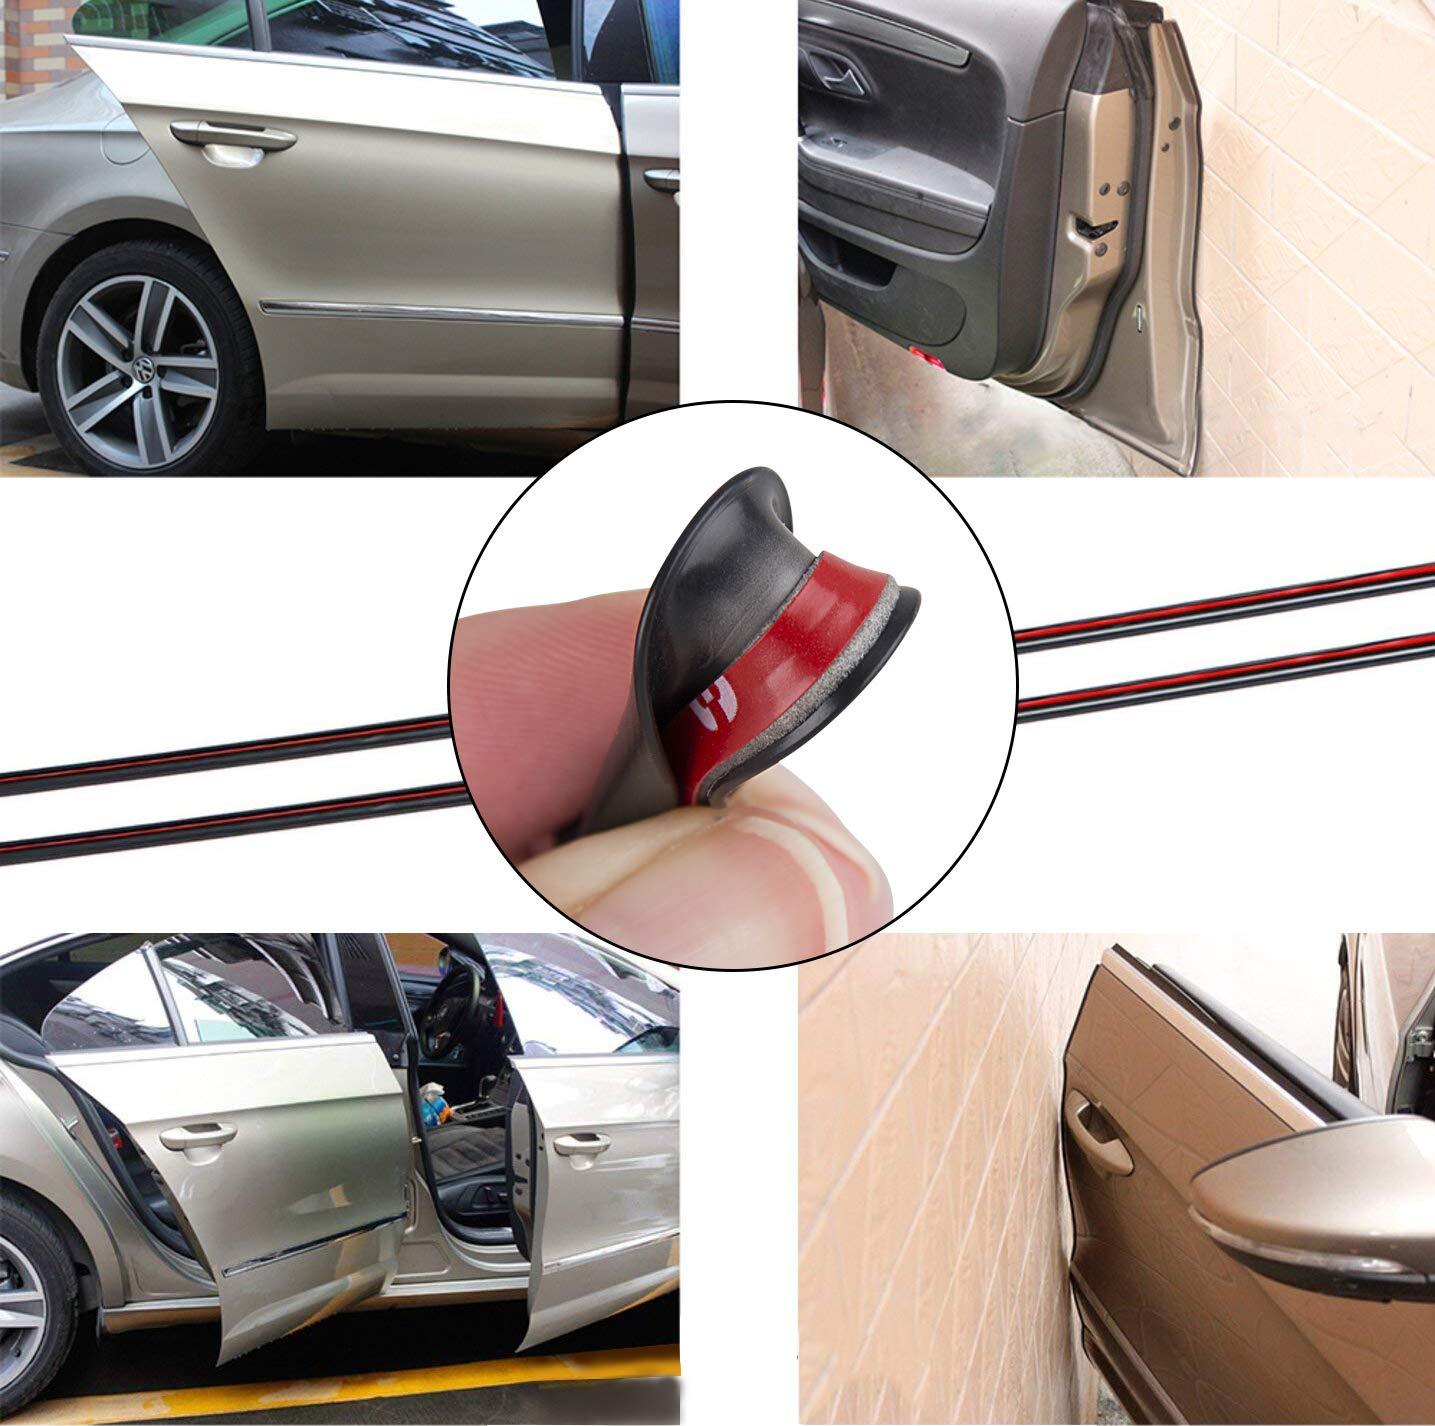 32ft Black Edge Door Guard Trim Car Molding Protector Auto Strip Moulding Guards